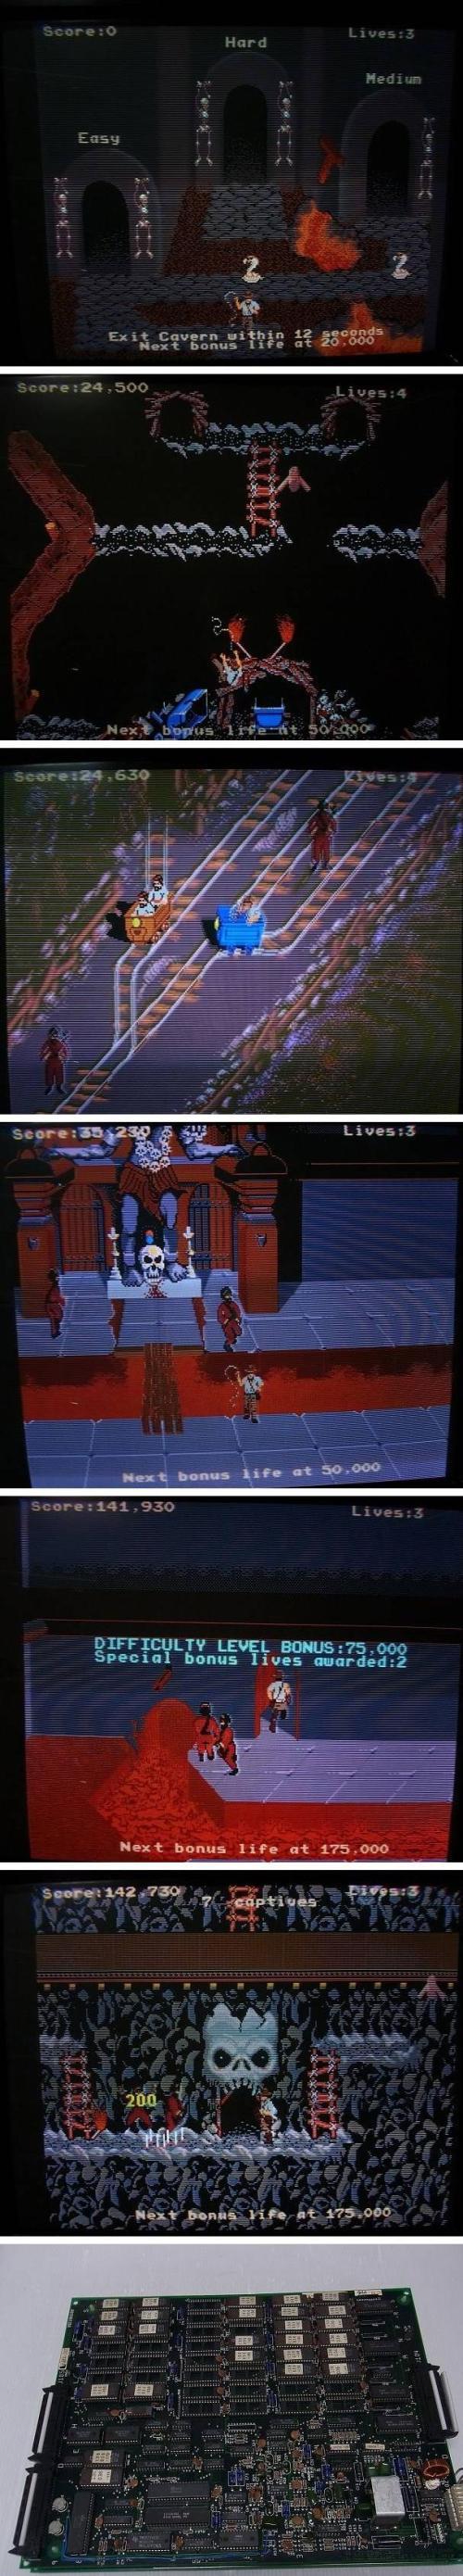 arcade-temple-of-doom-01